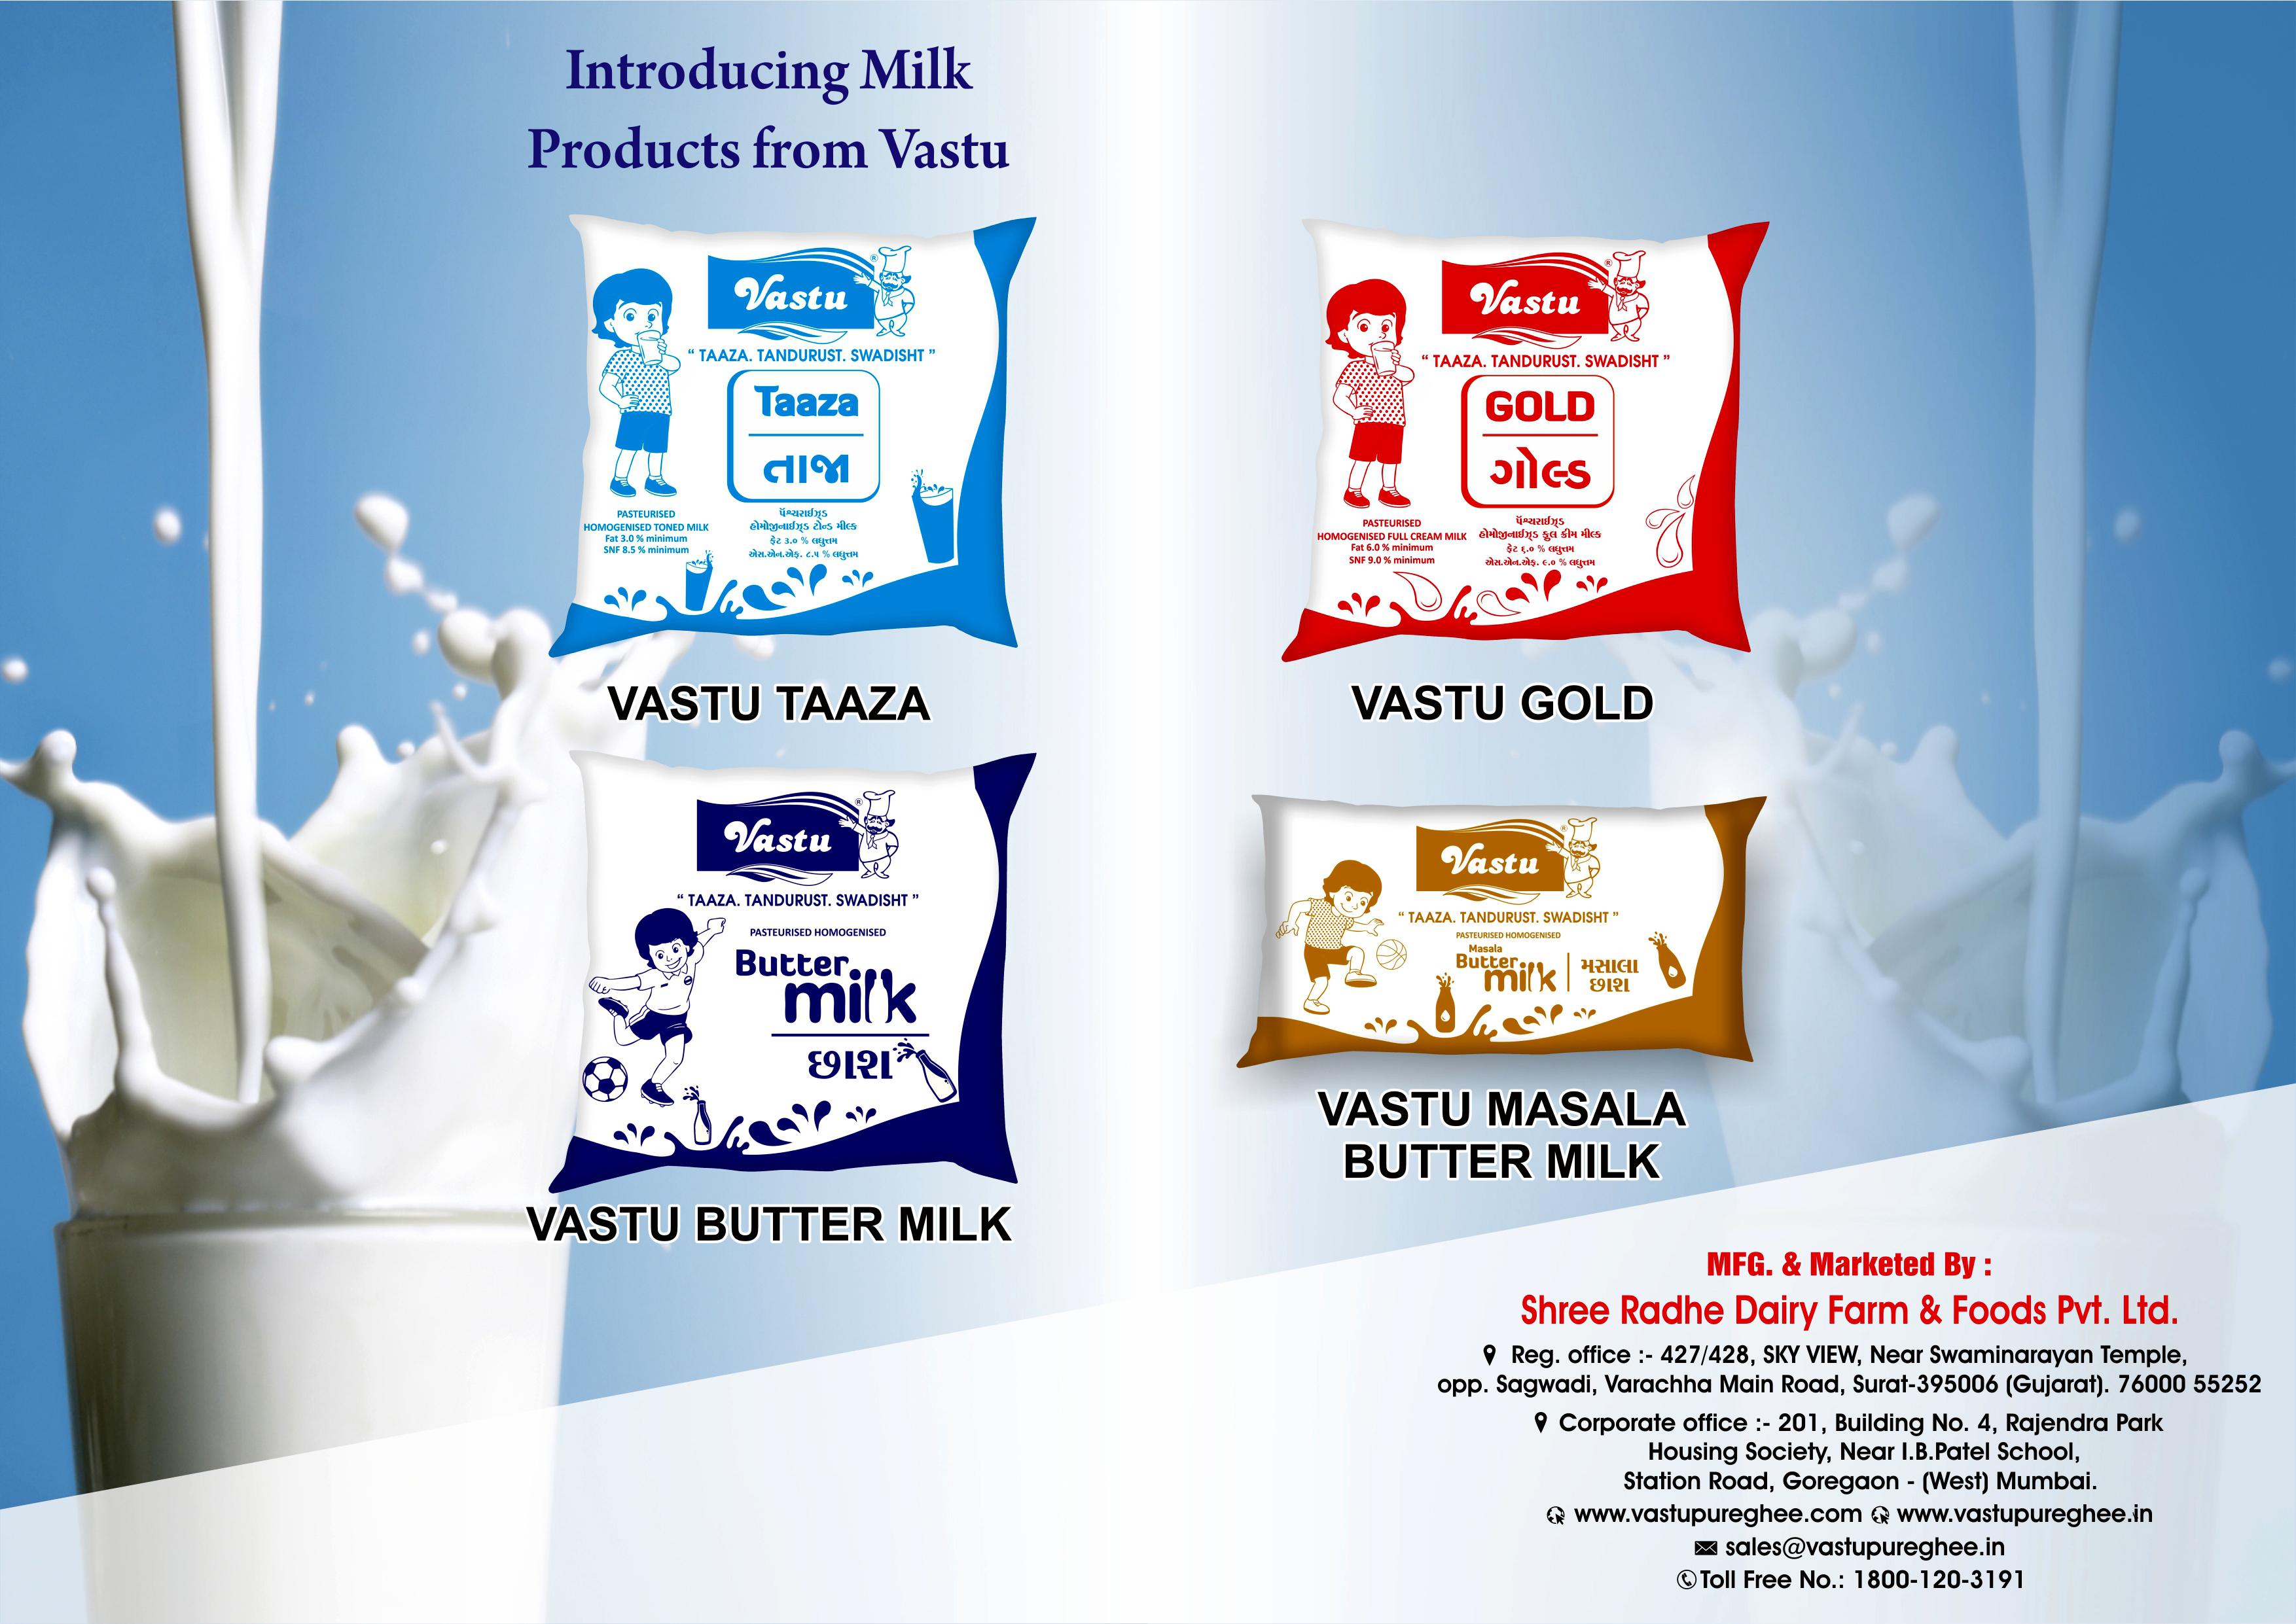 Vastu Butter Milk